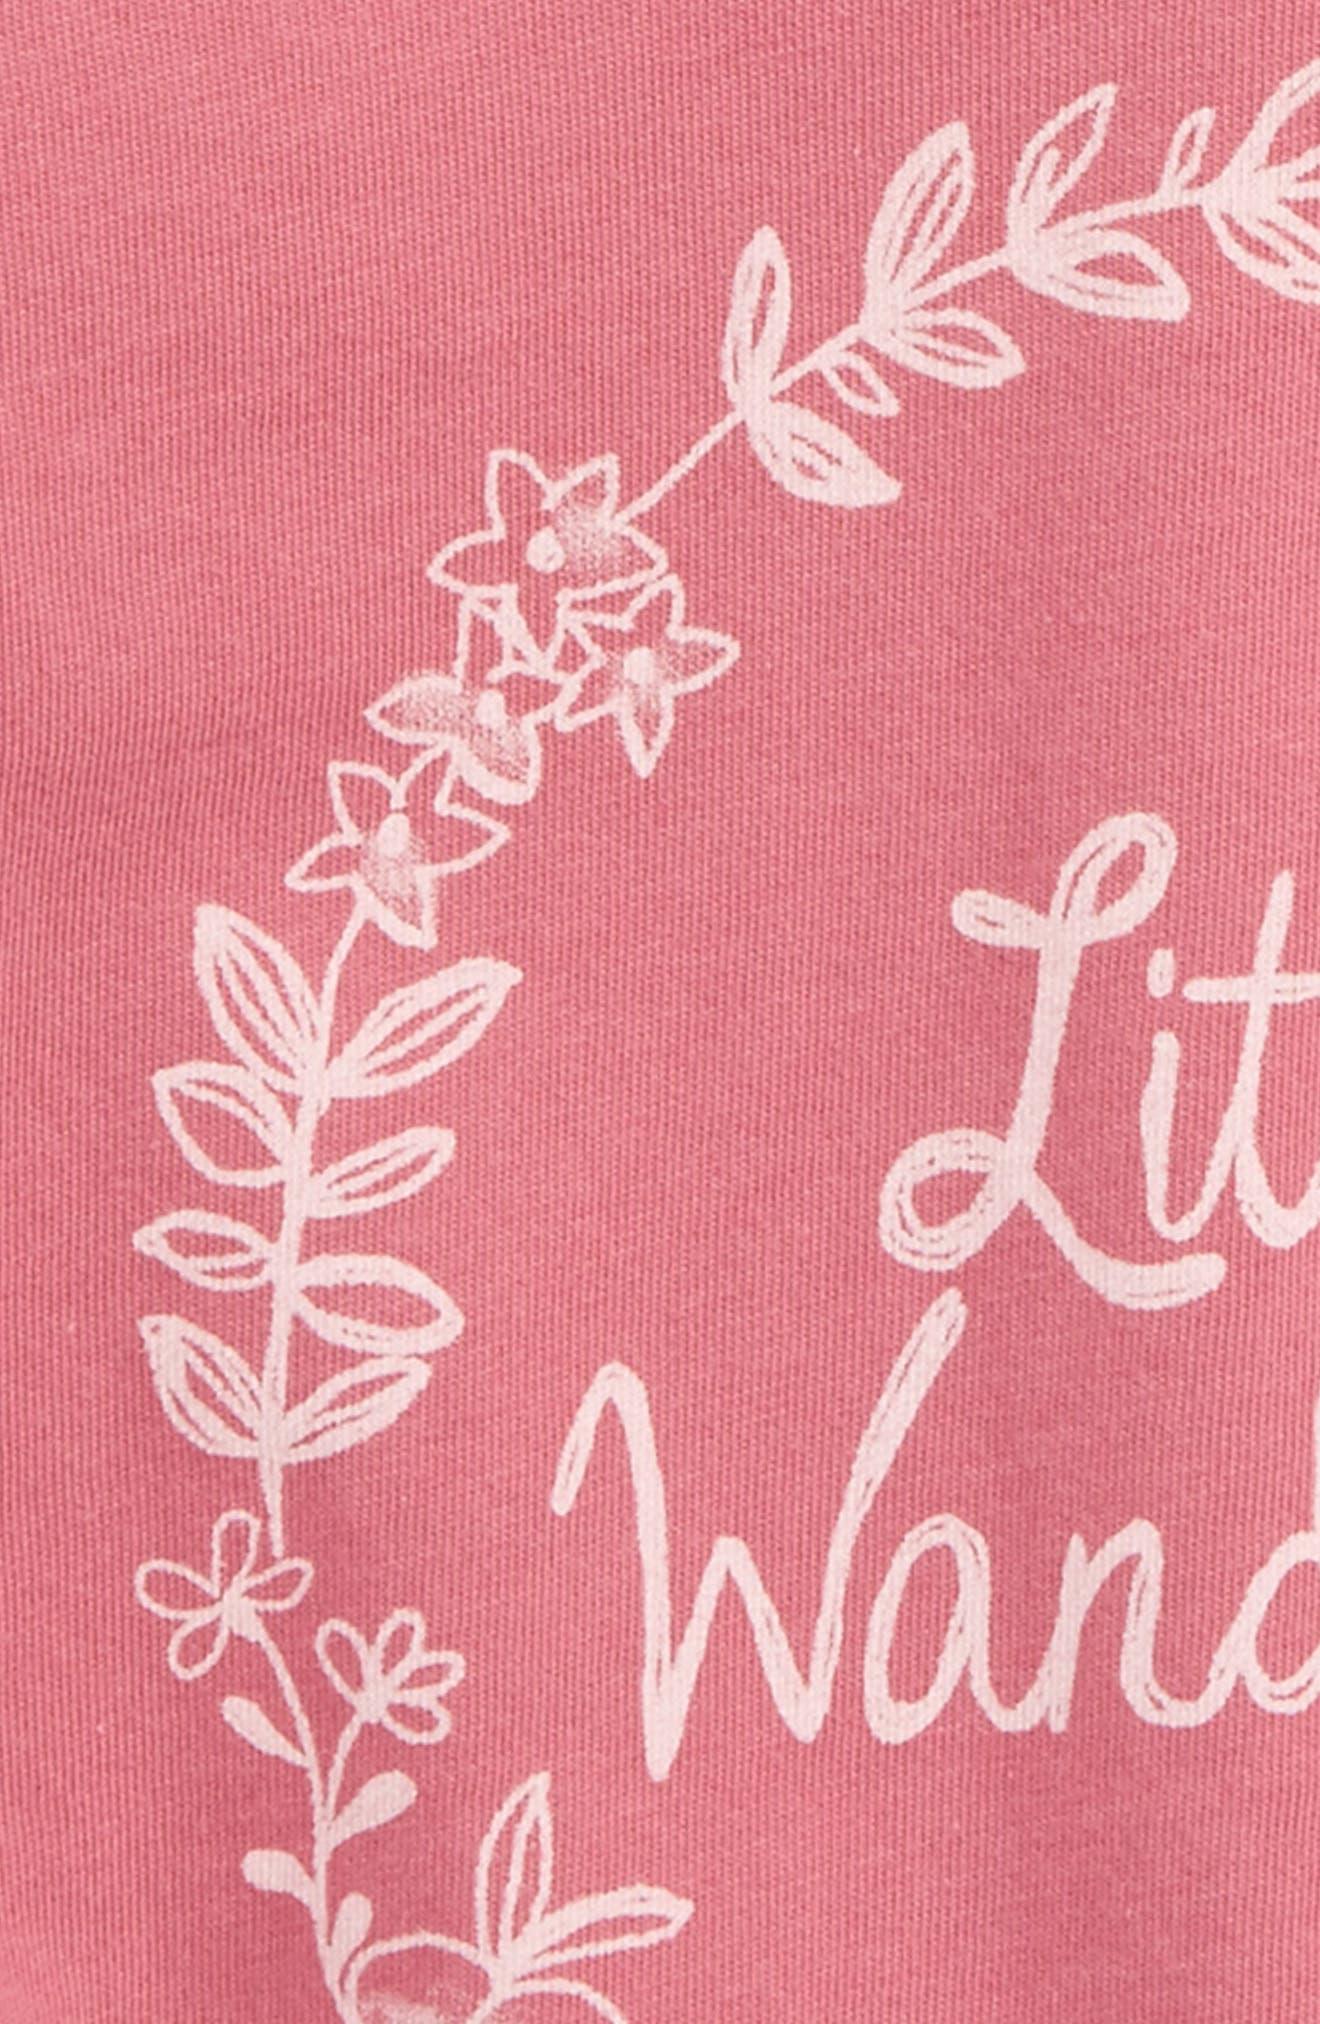 Peek Little Wanderer Graphic Tee,                             Alternate thumbnail 3, color,                             514